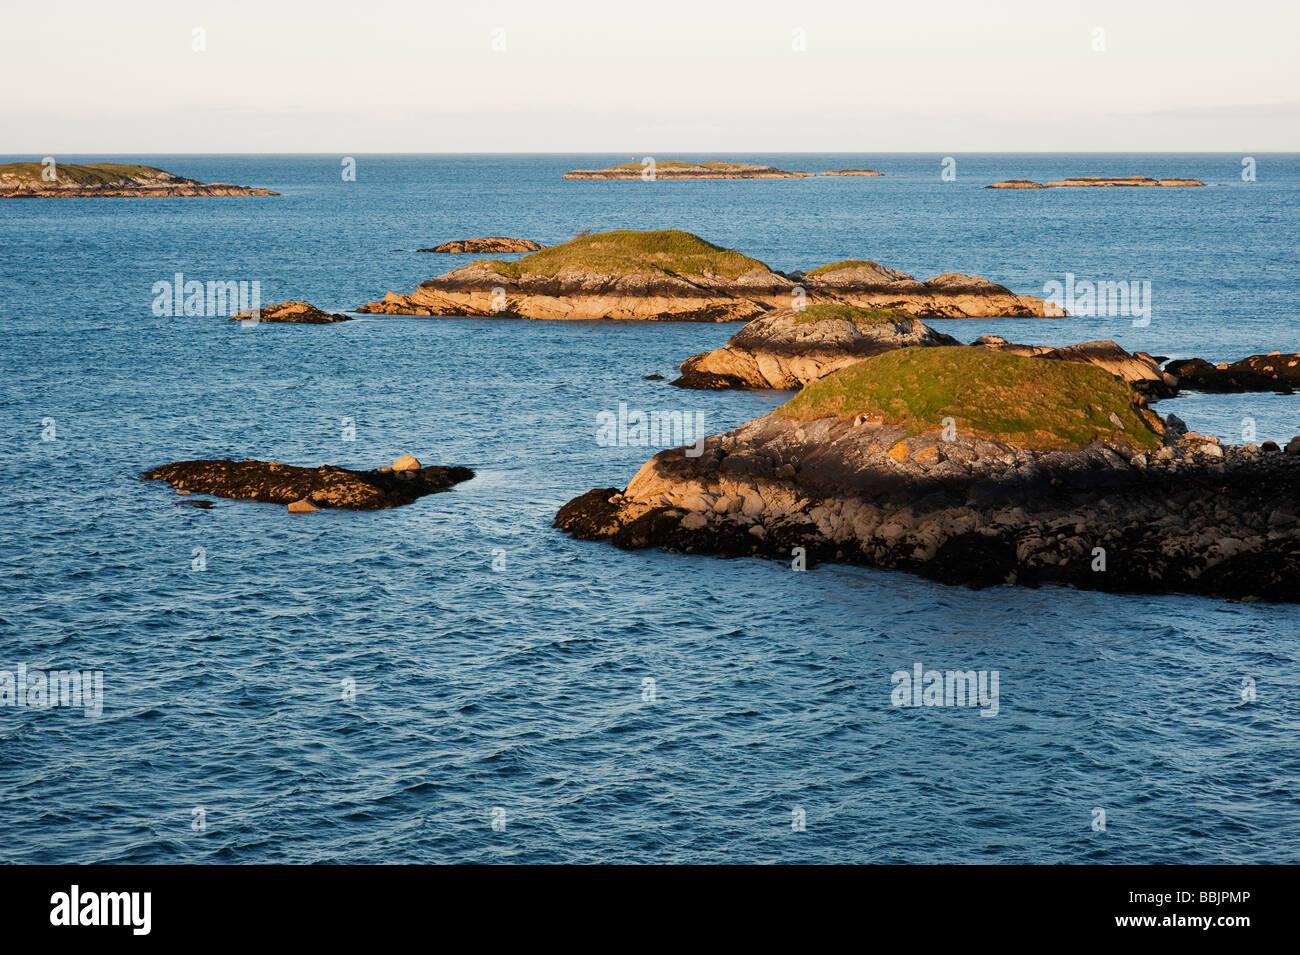 East Coast islands, Isle of Harris, Outer Hebrides, Scotland - Stock Image